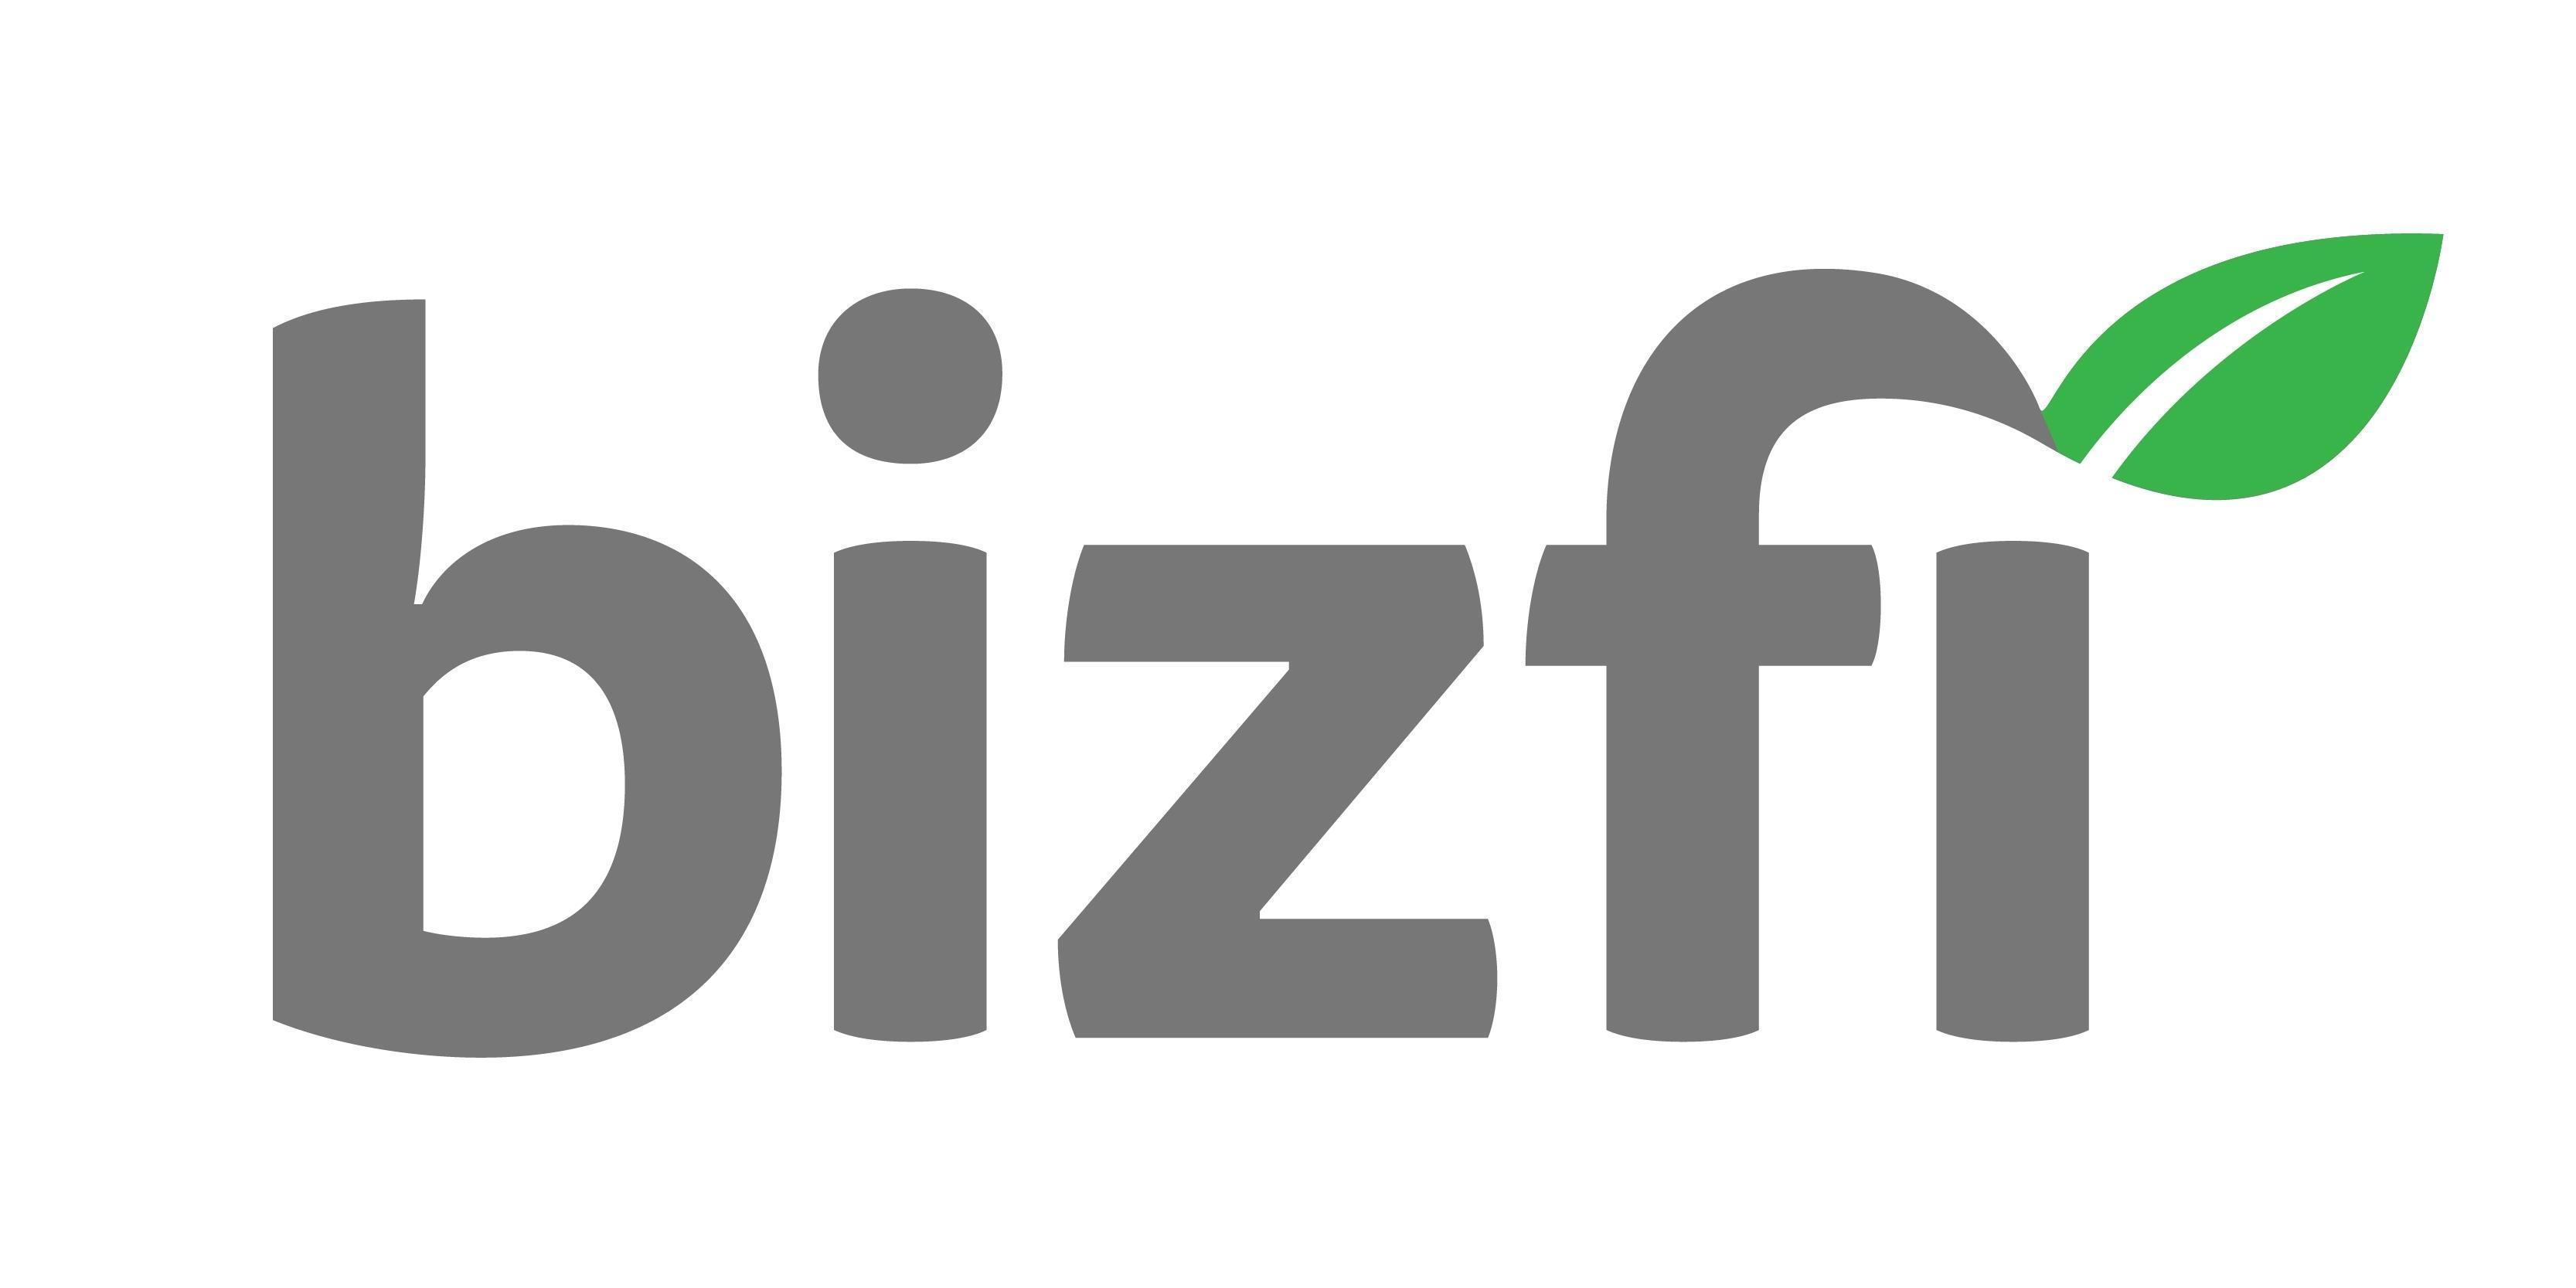 Bizfi company logo